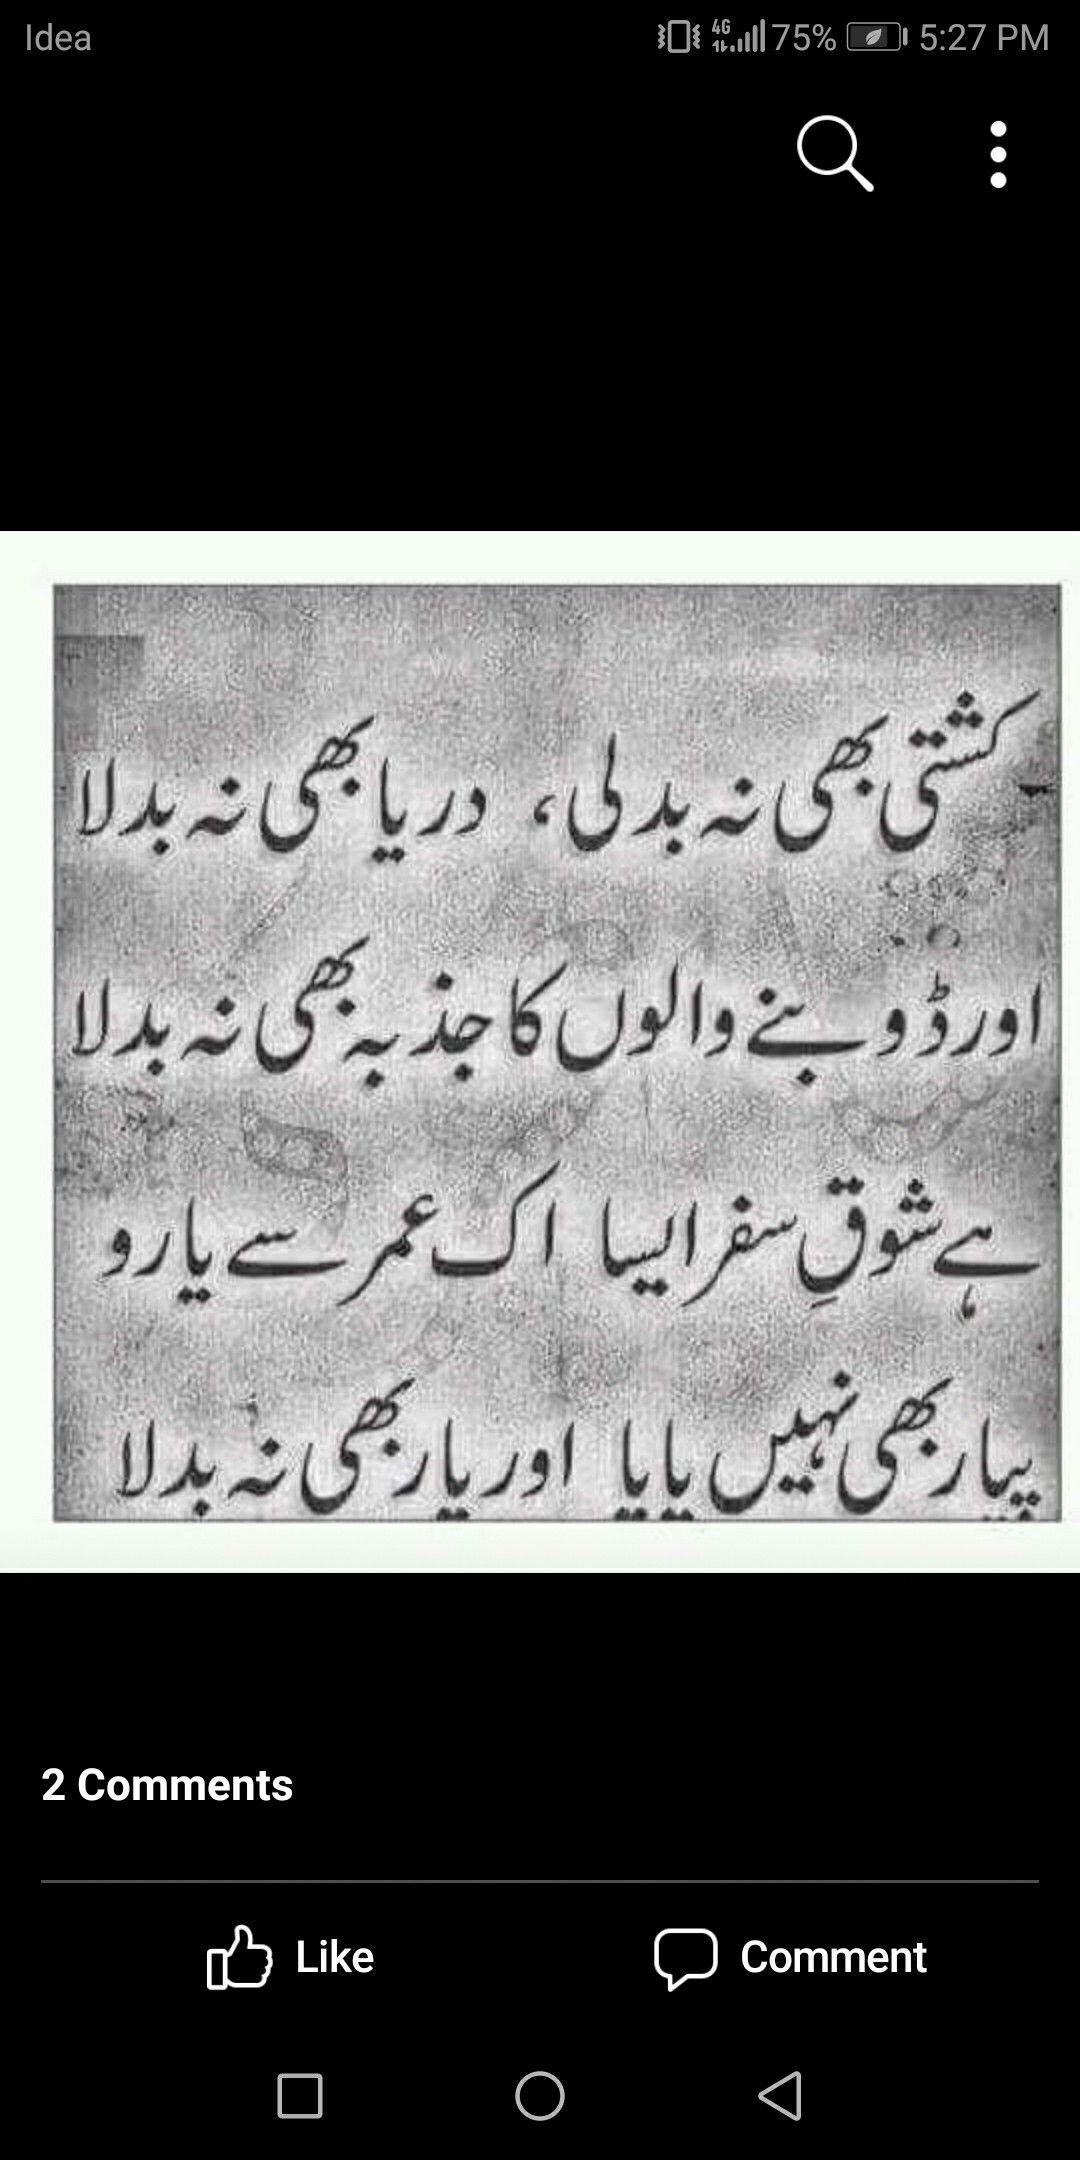 Pin by Fawwad Khan on بد نام۔وہ۔كردیا۔بڑے۔پیار۔سے Diy